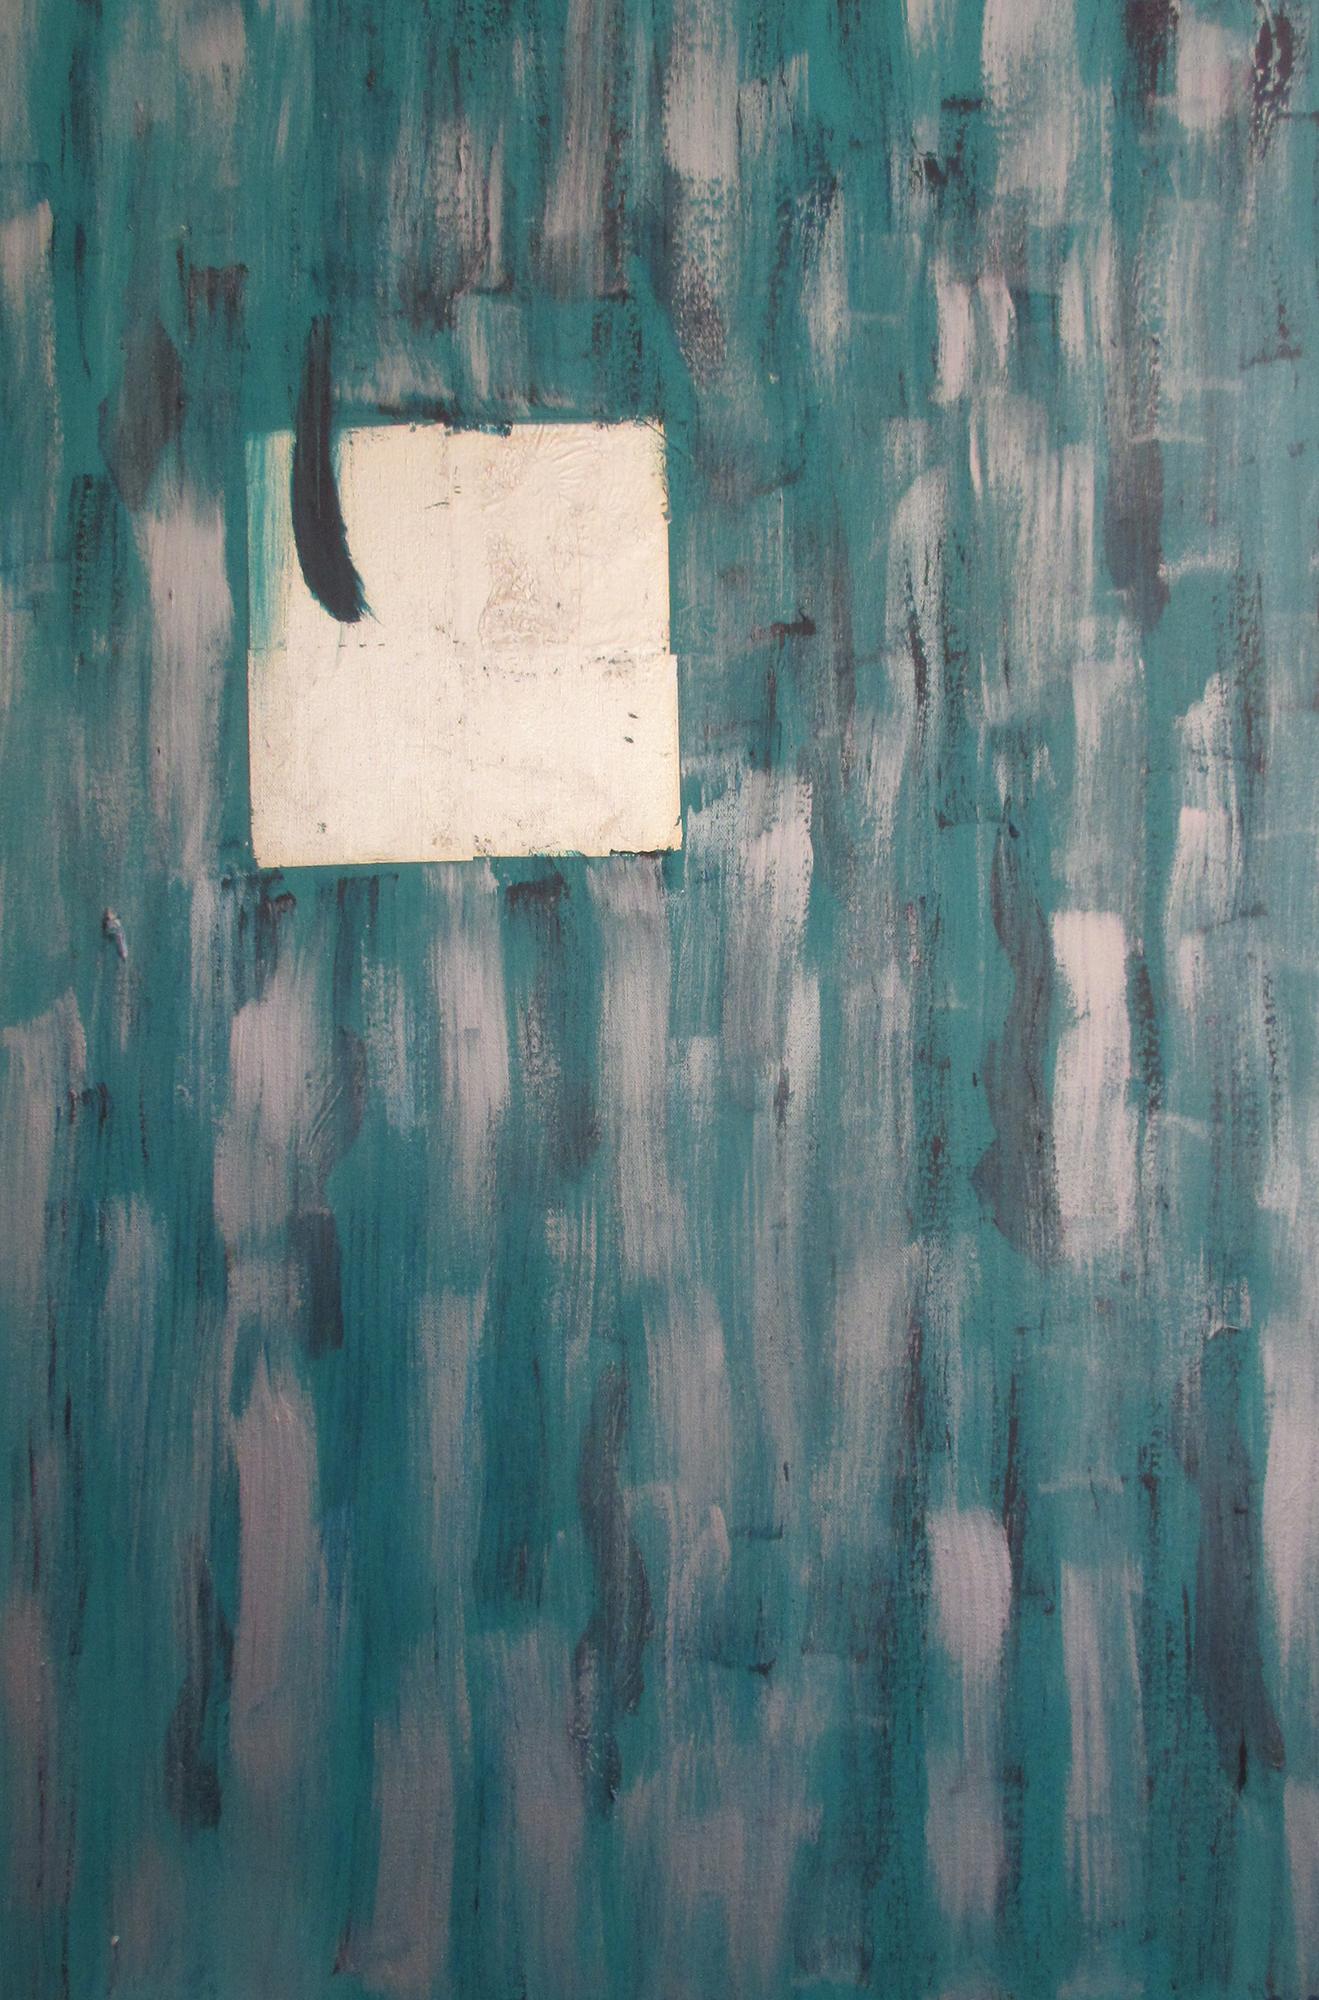 455.Tapistry in Turquoise 36 x 24..jpg